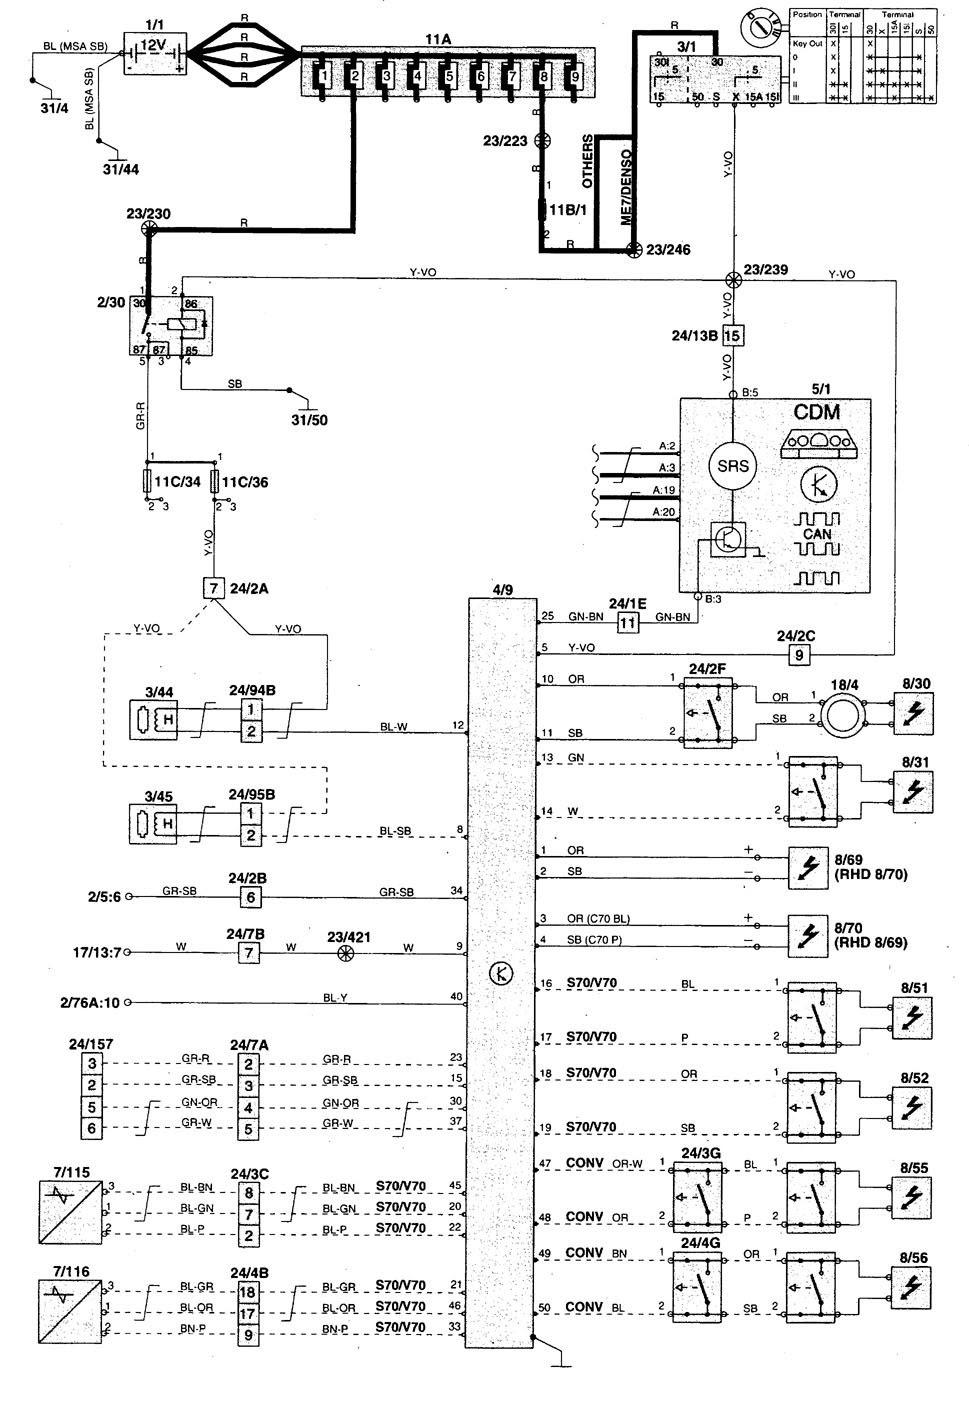 Volvo V70 Ignition Wiring Diagram Honda Trx300ex Wiring Diagram Usb Cable Yenpancane Jeanjaures37 Fr